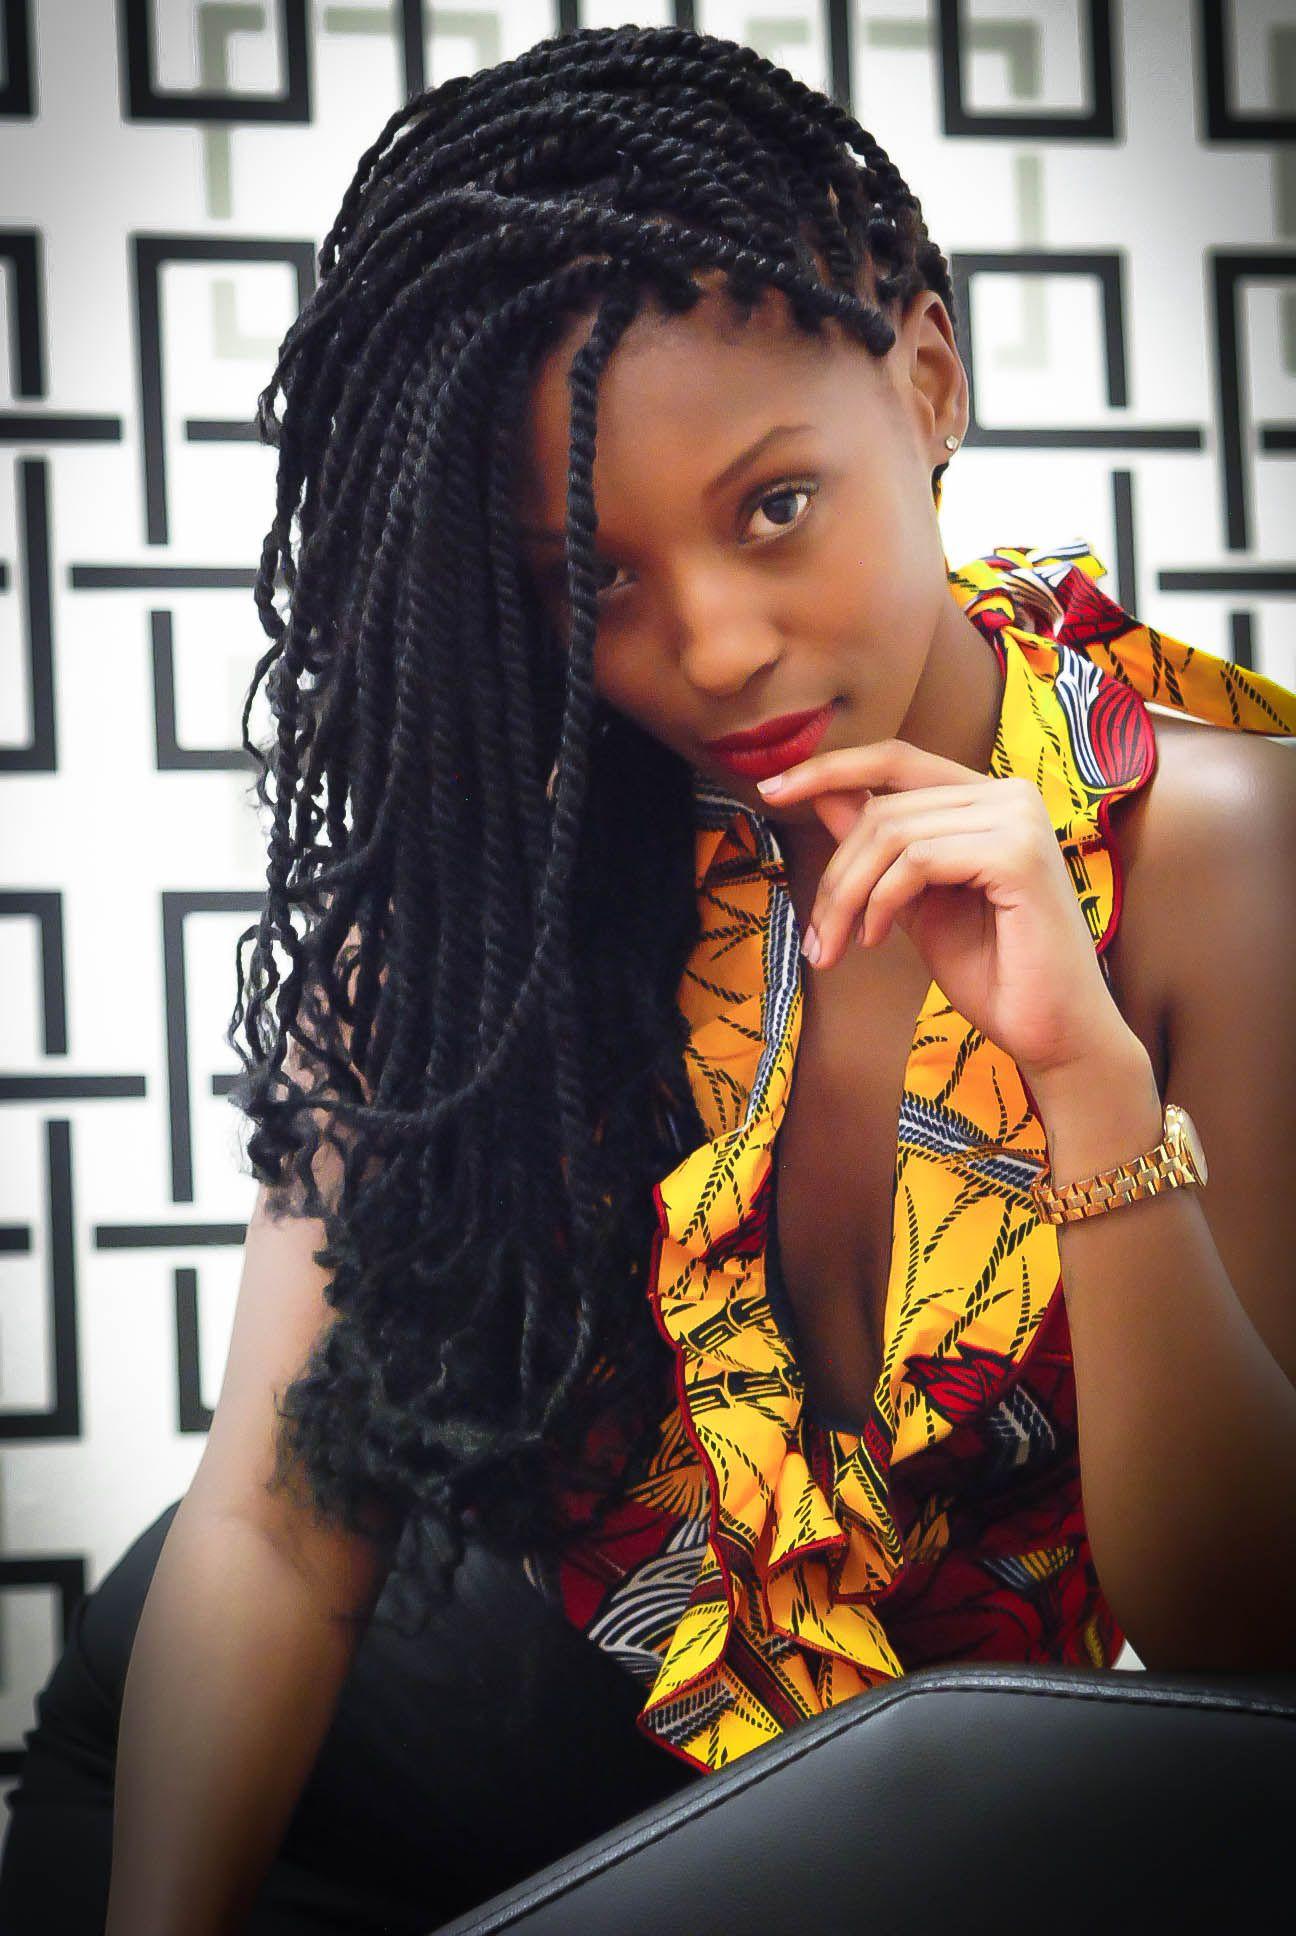 marley twist 6 - senegalese twists charlotte nc | unisex